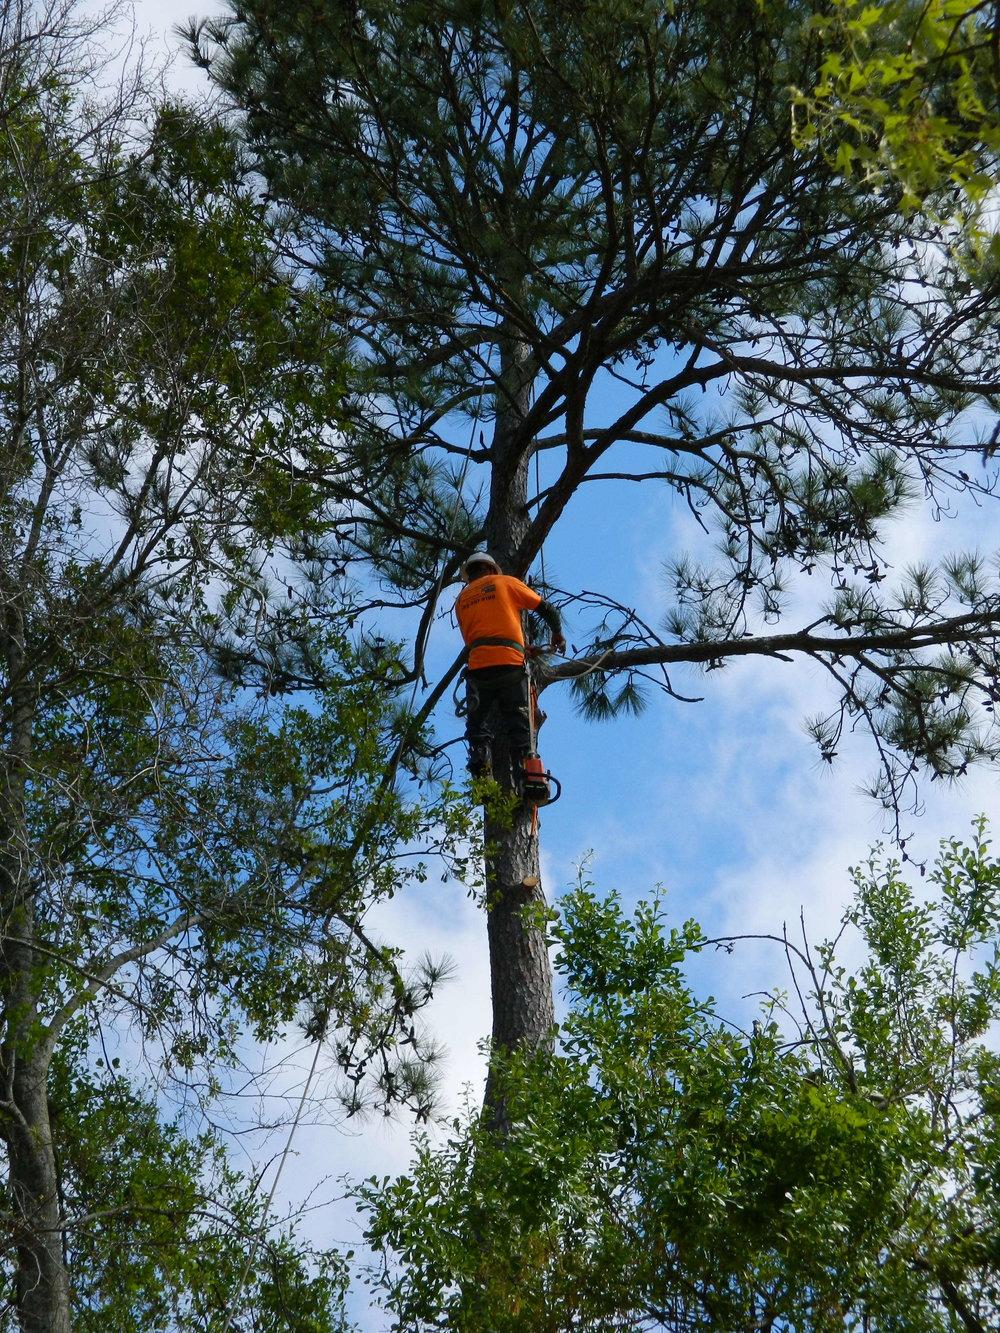 climbing trees in Kingwood, TX